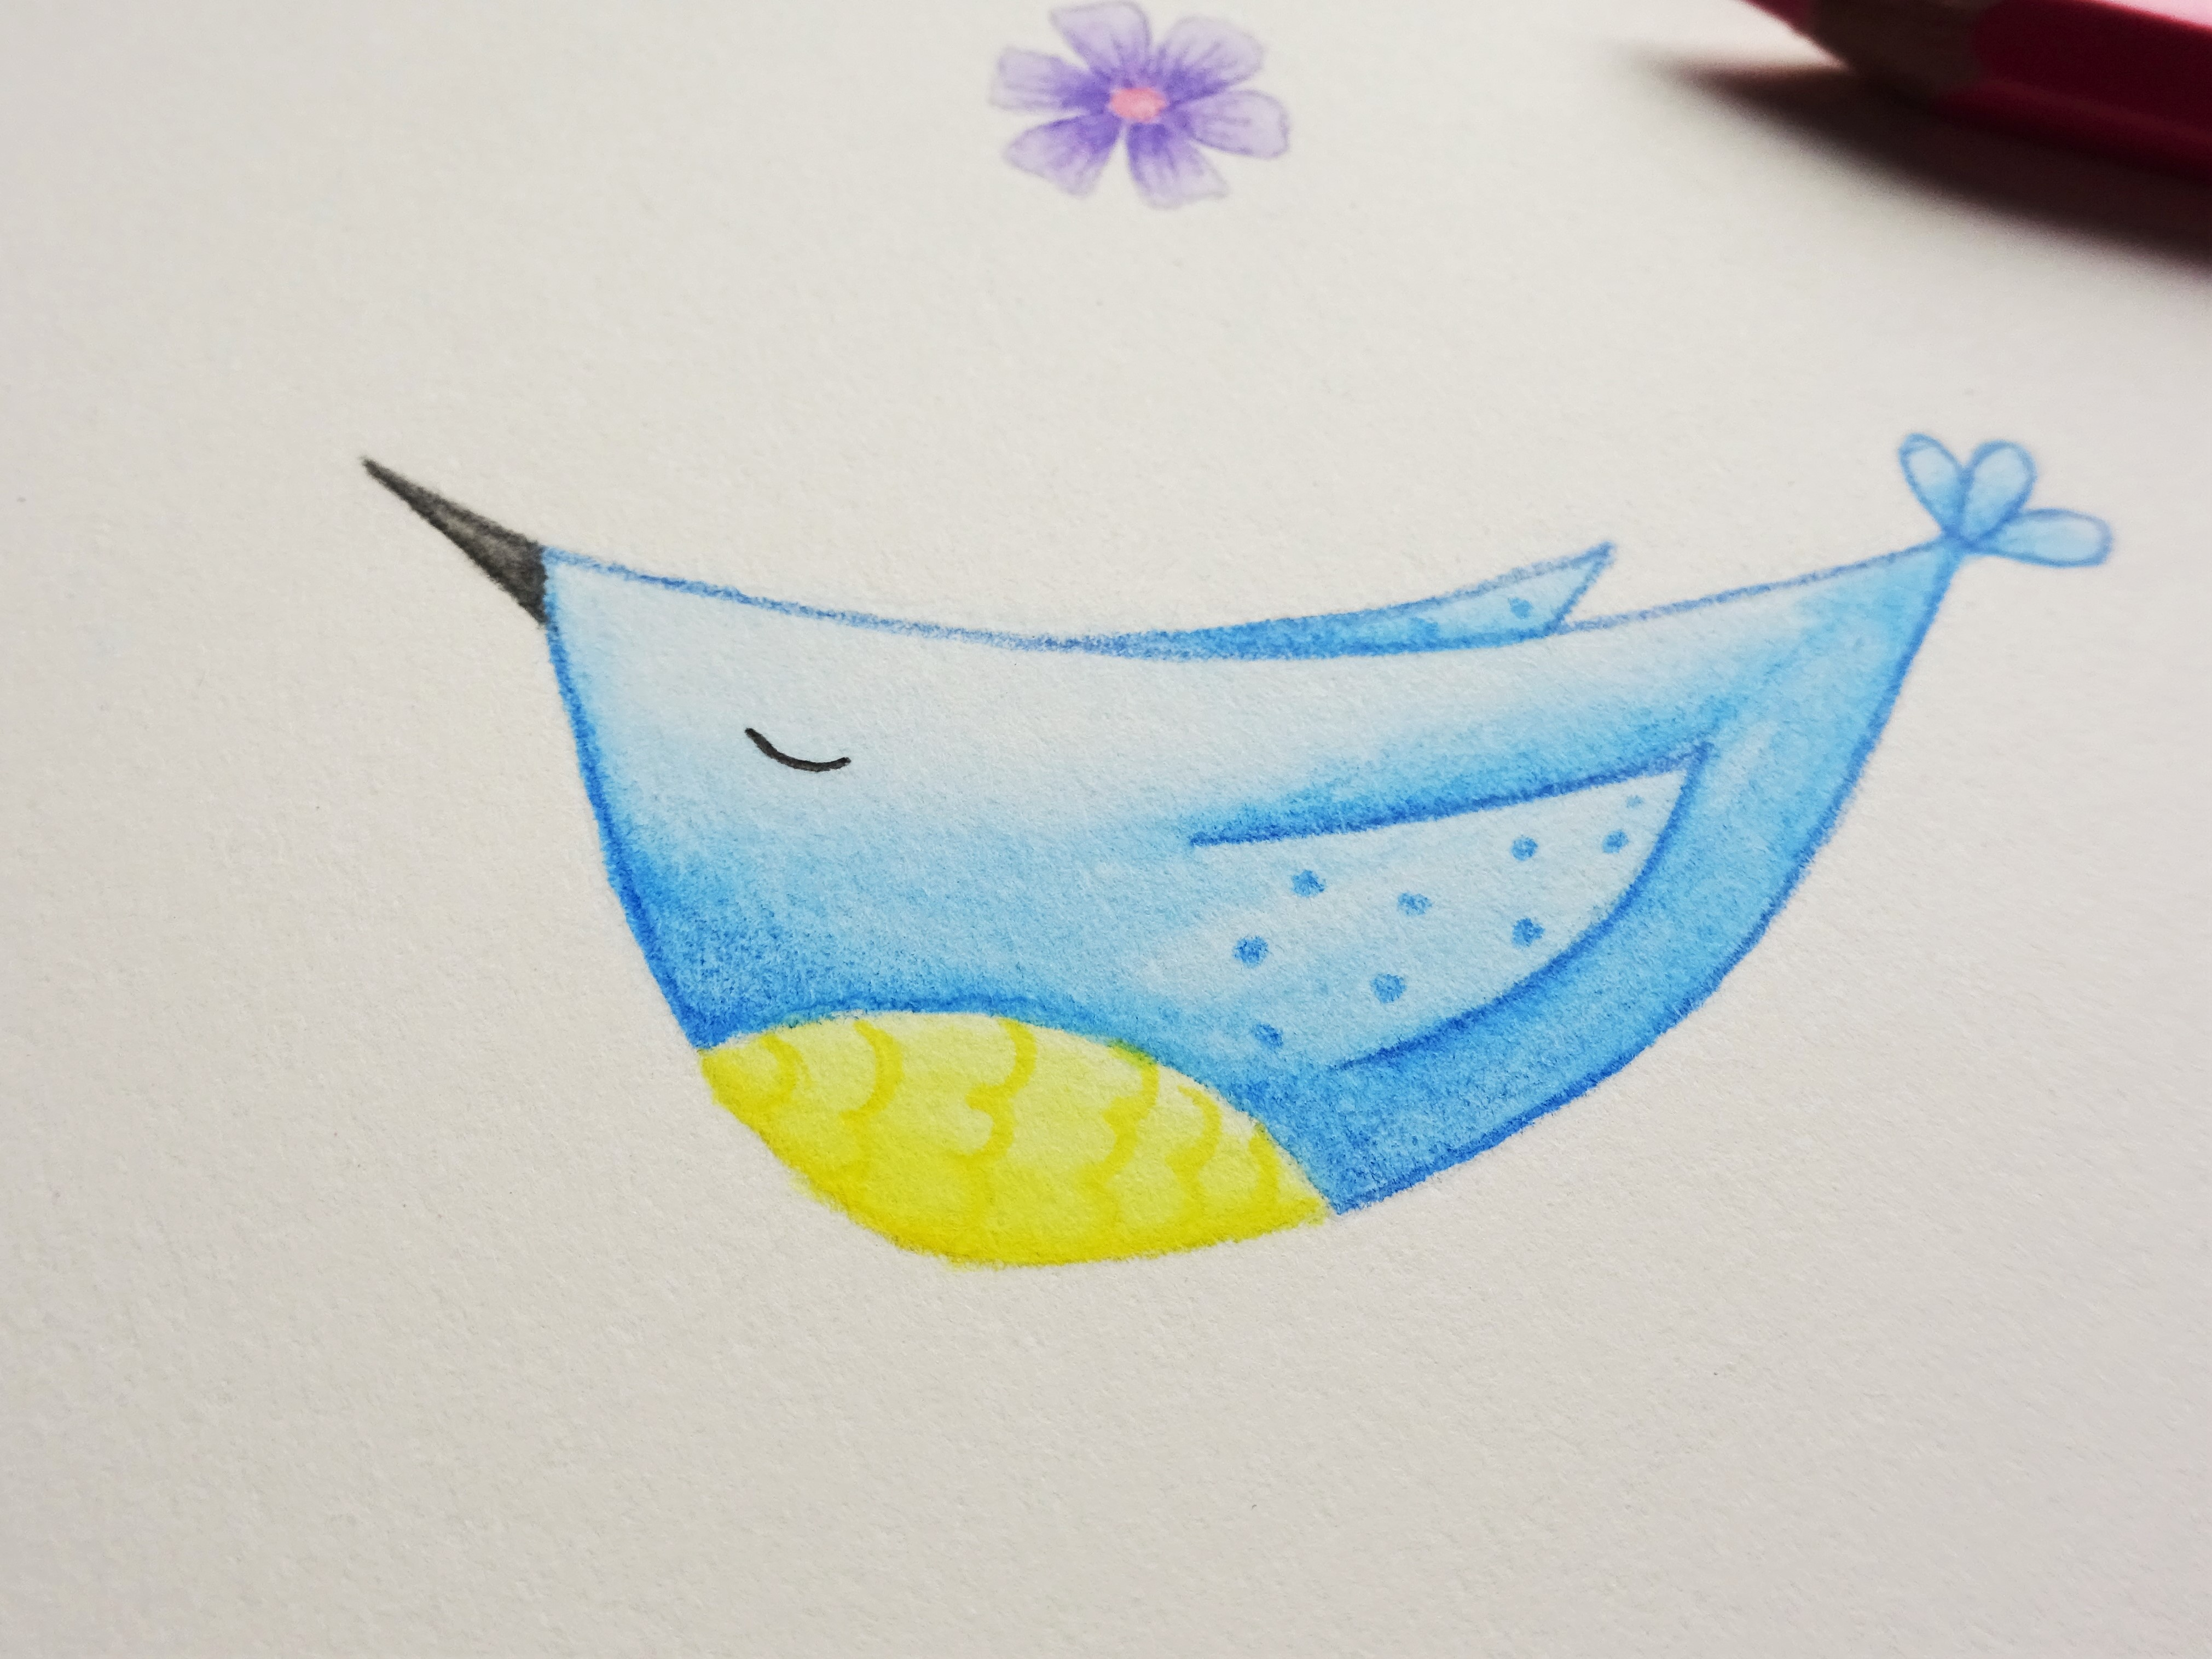 A blue watercolour pencil bird with a yellow tummy